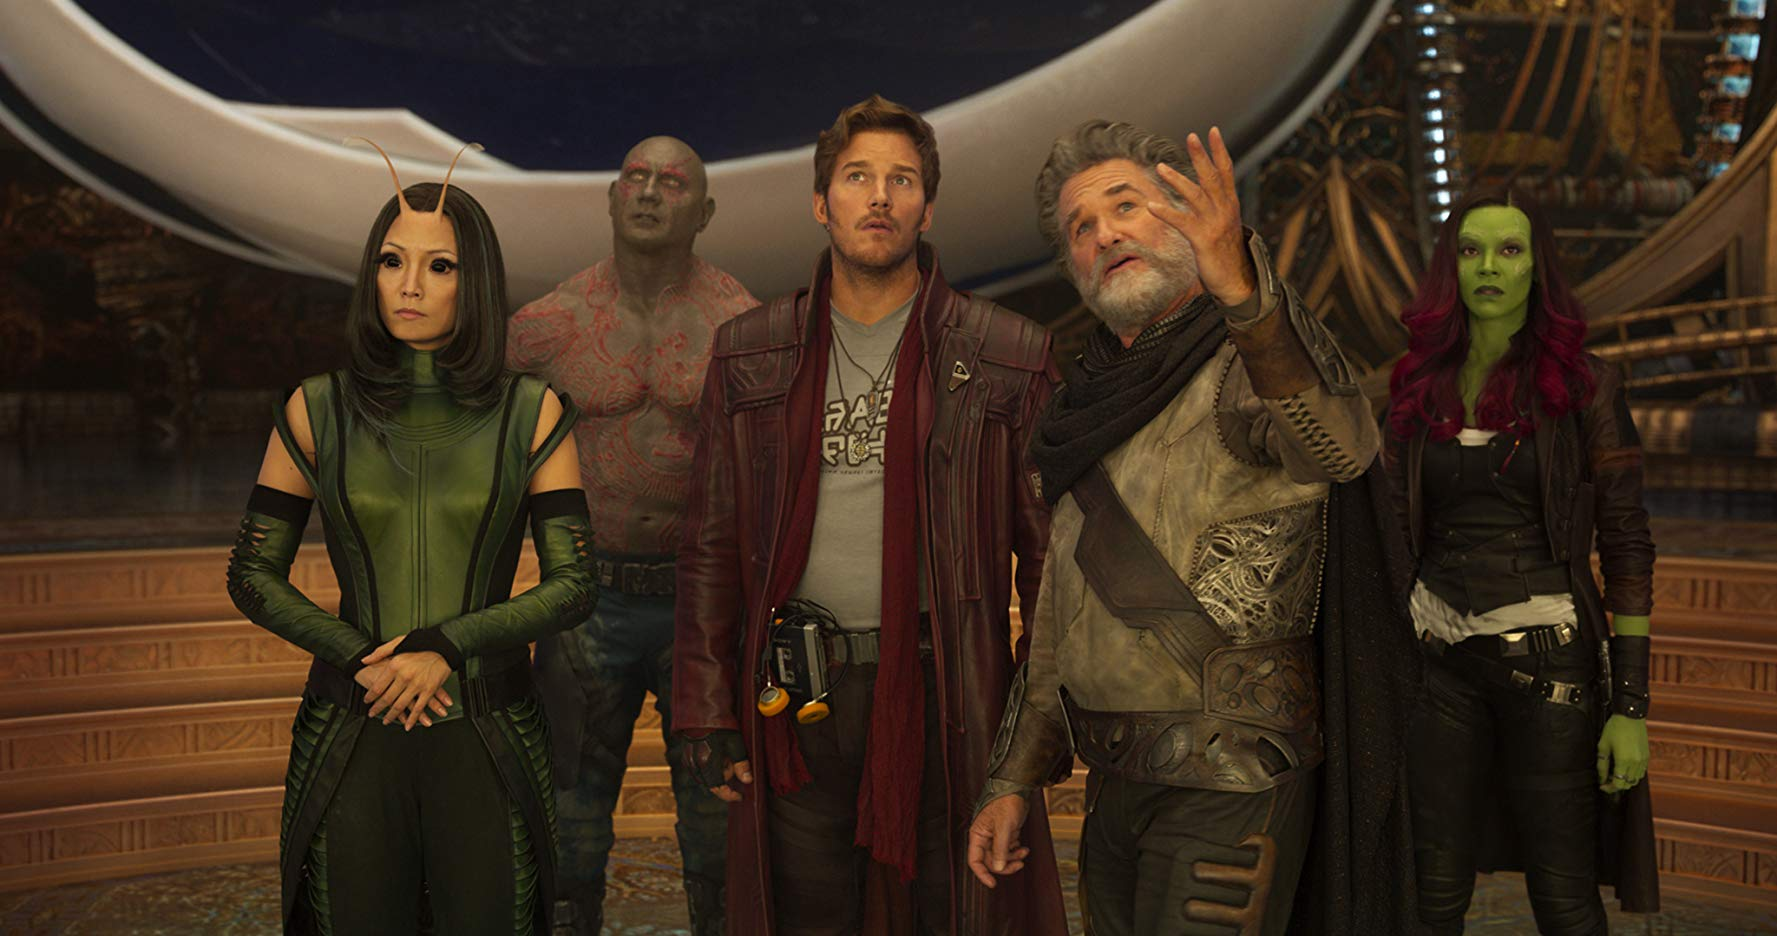 Best stream movies sites 2020 tv shows